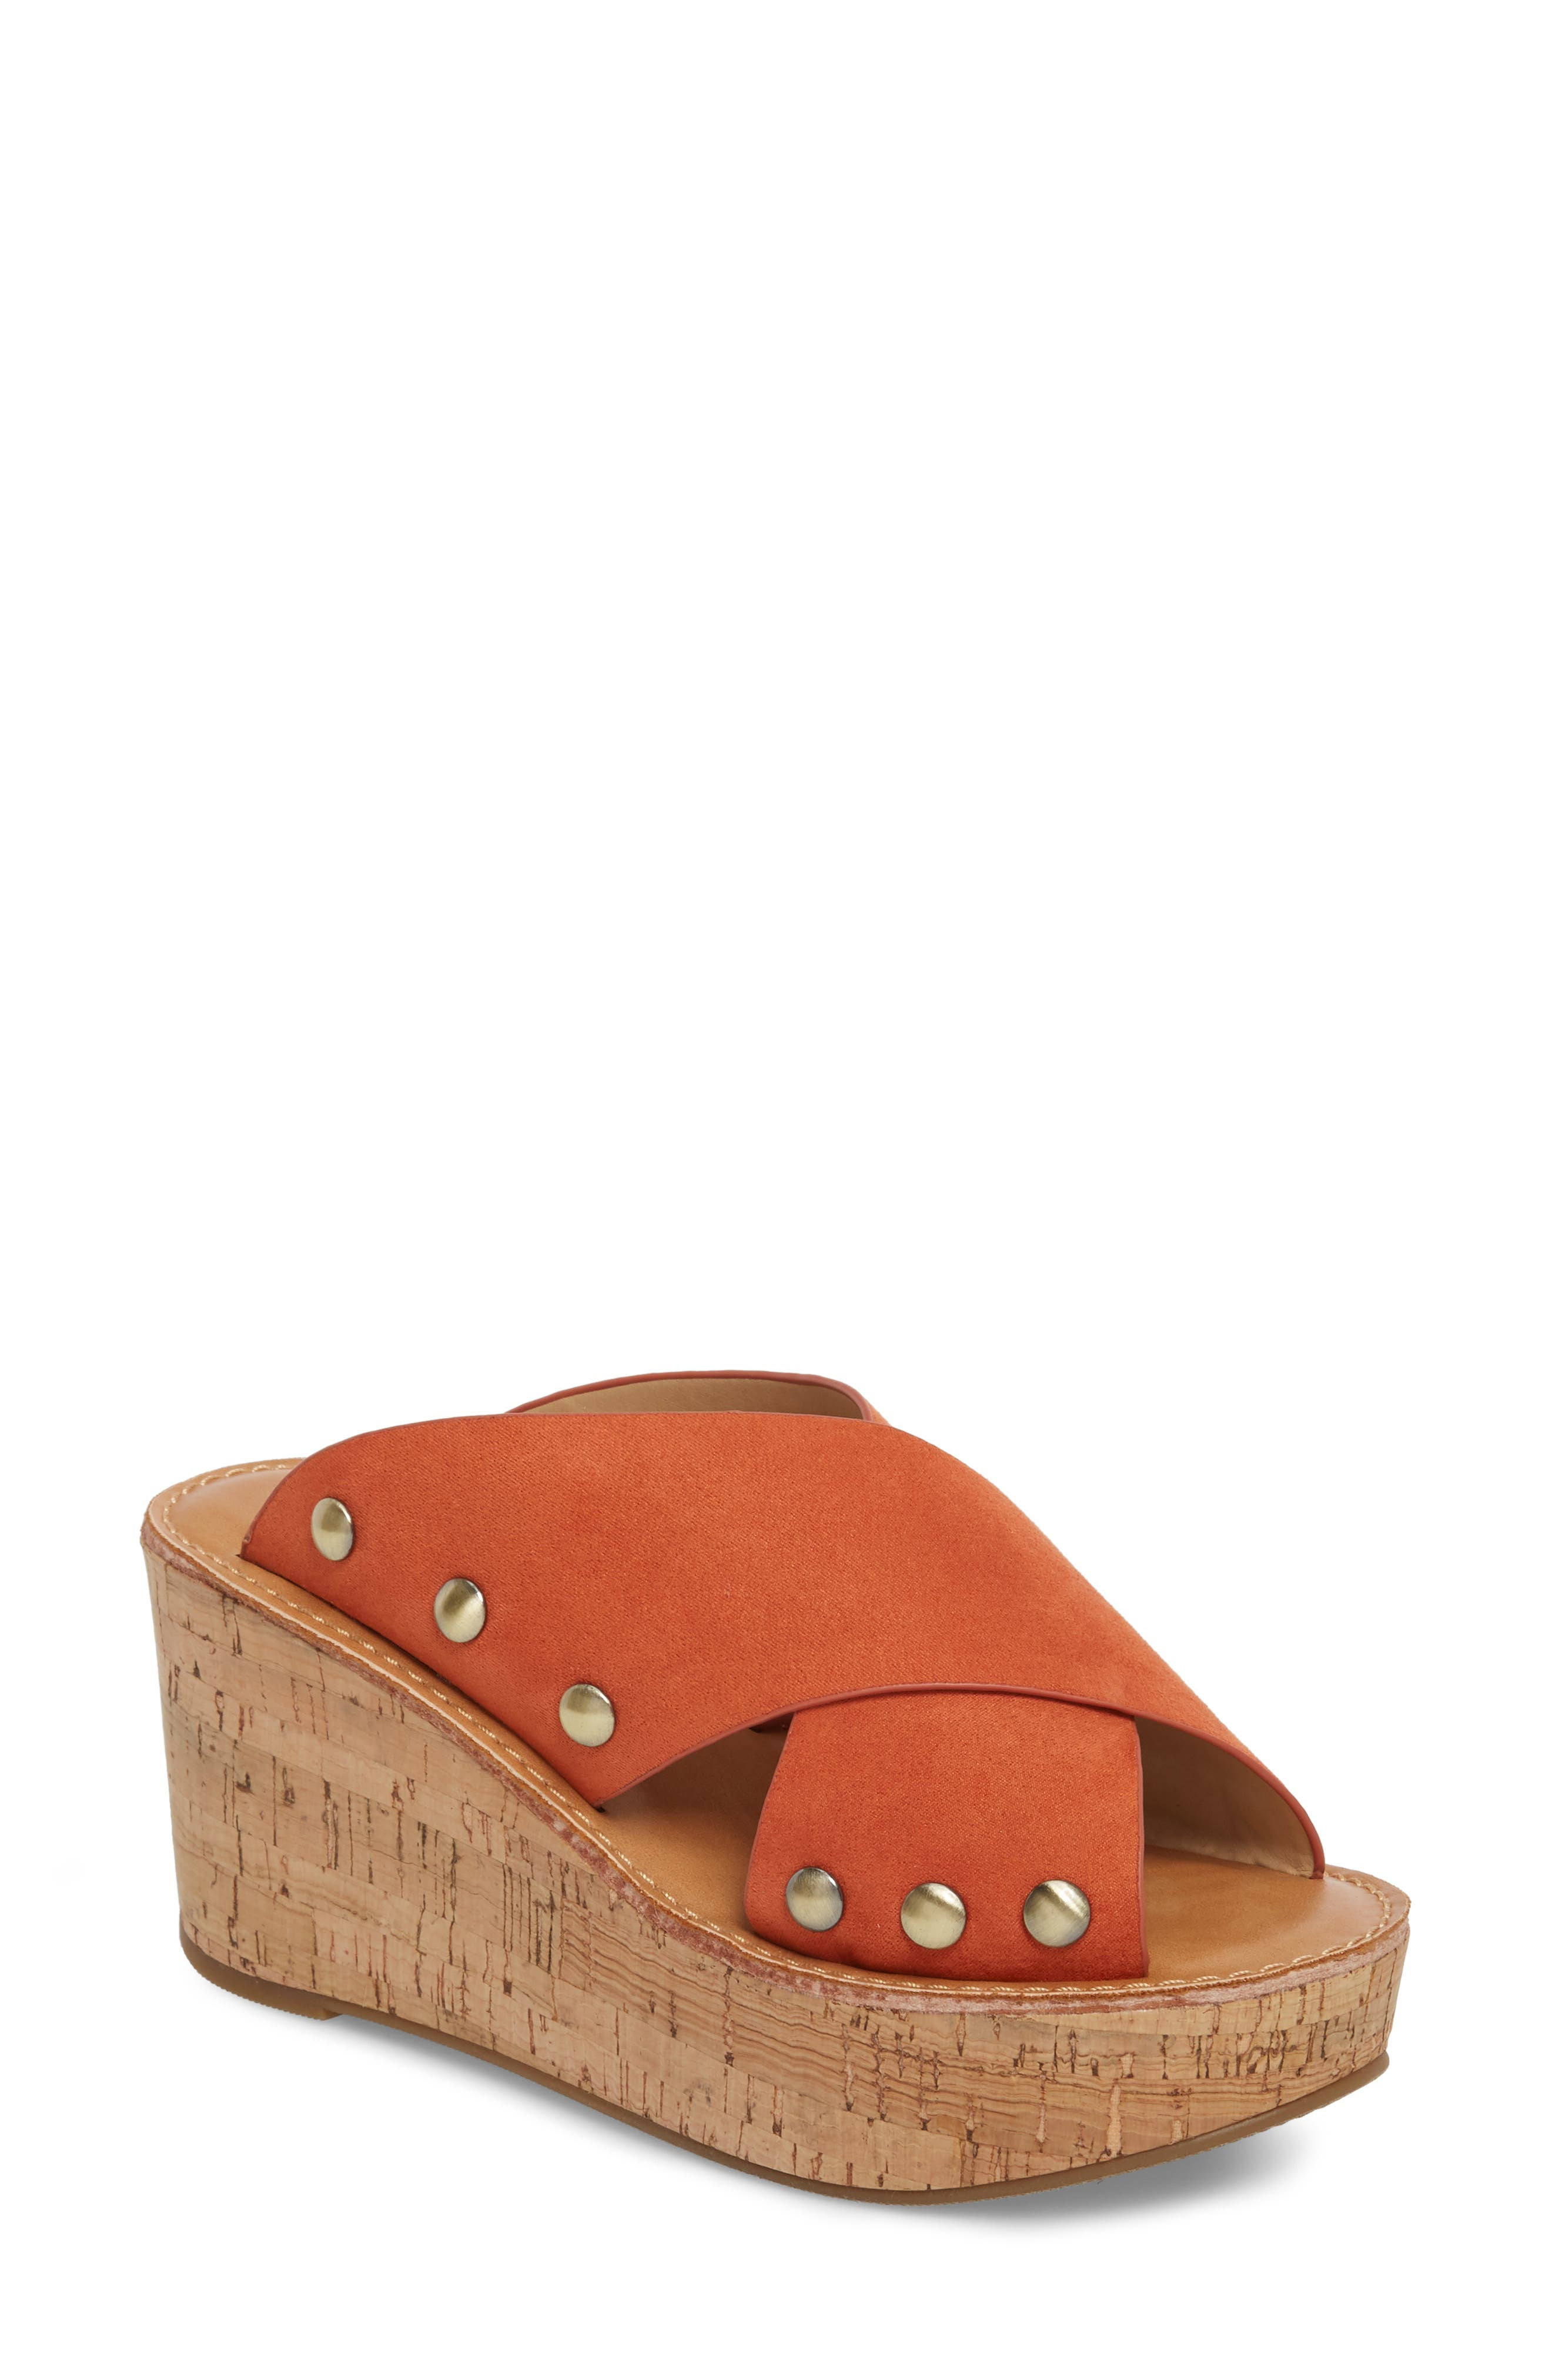 Women's OAHU Wedge Sandal